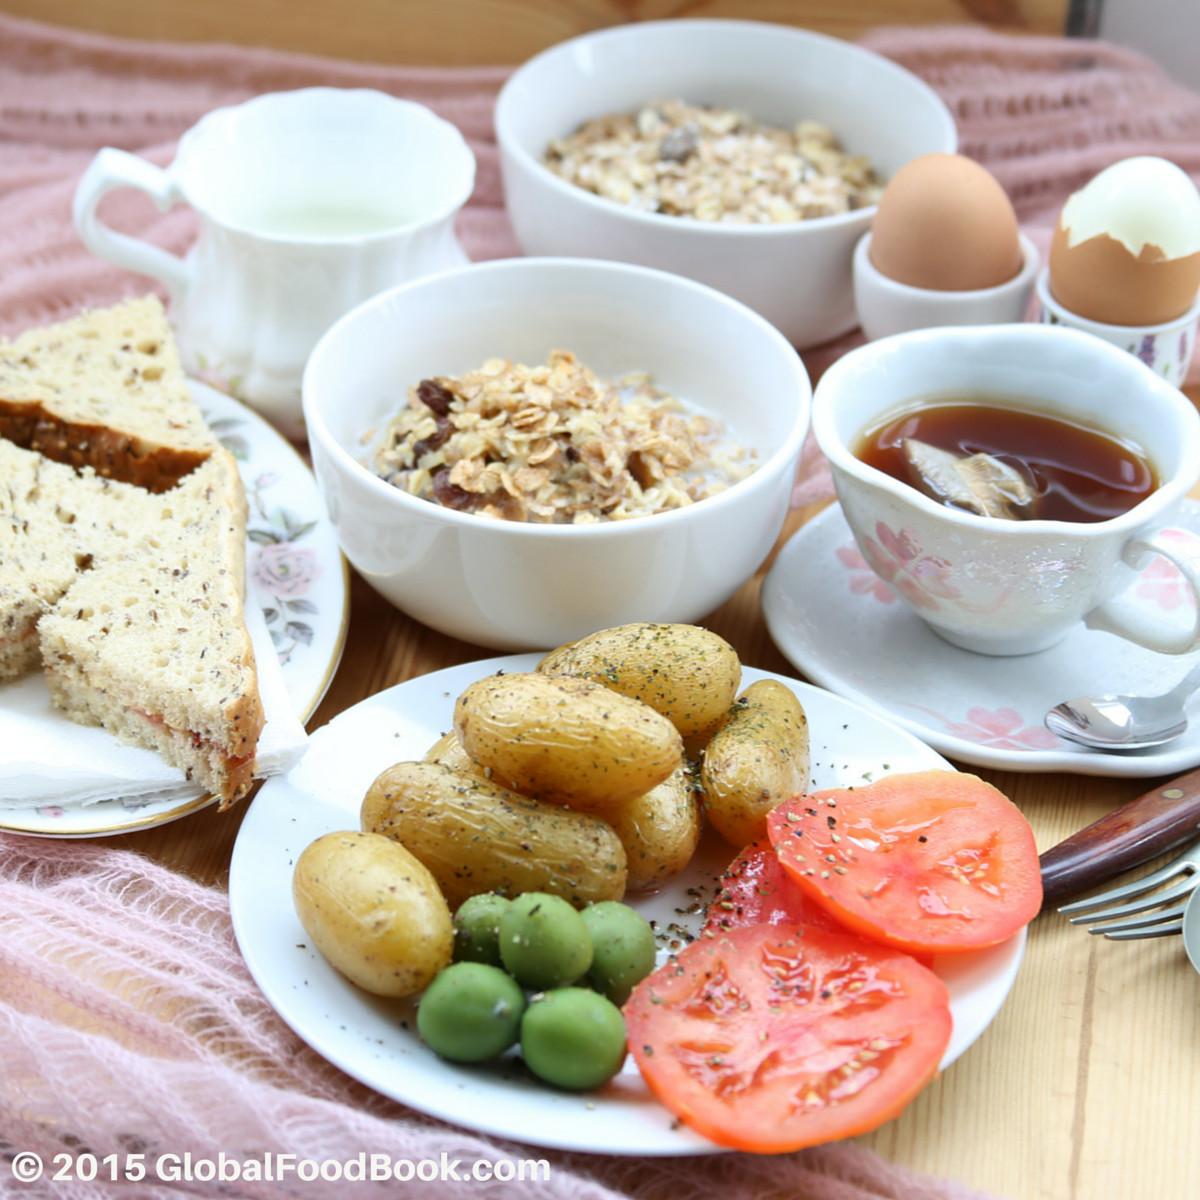 A Healthy Breakfast  Eat A Big Healthy Breakfast To Get Your Eggs Fertilised